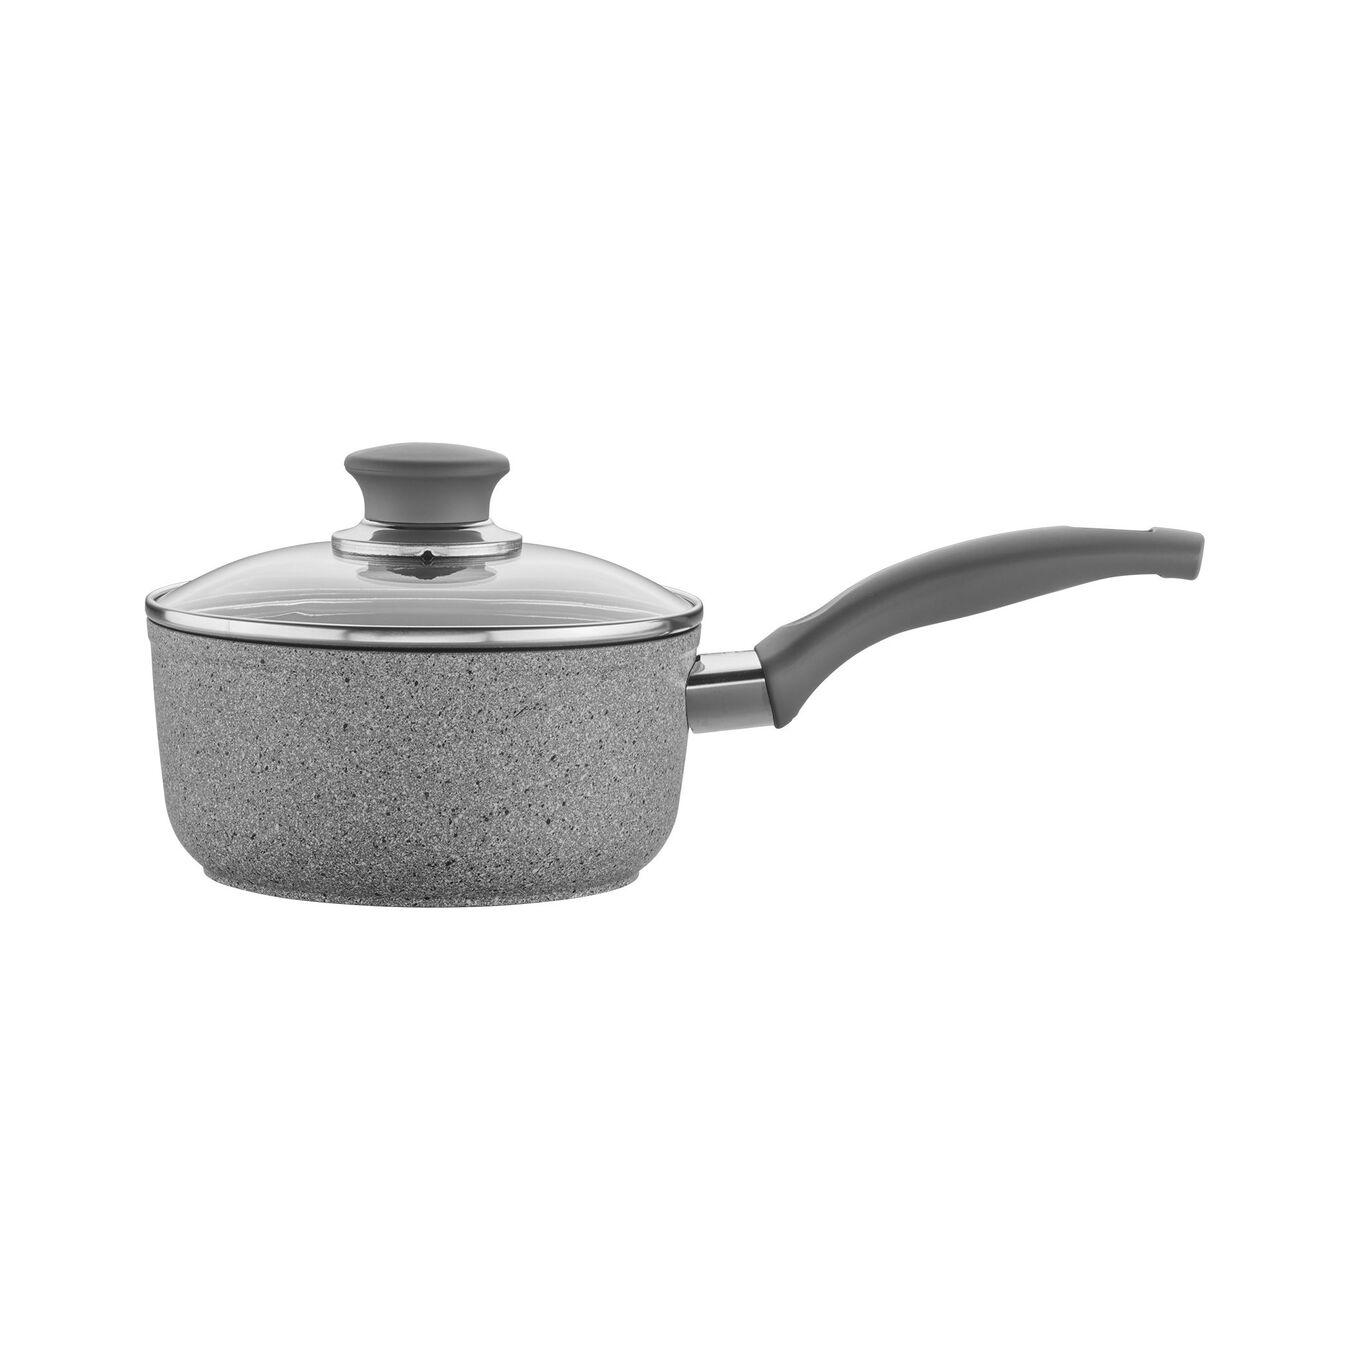 2.8-qt Nonstick Saucepan with Lid,,large 1